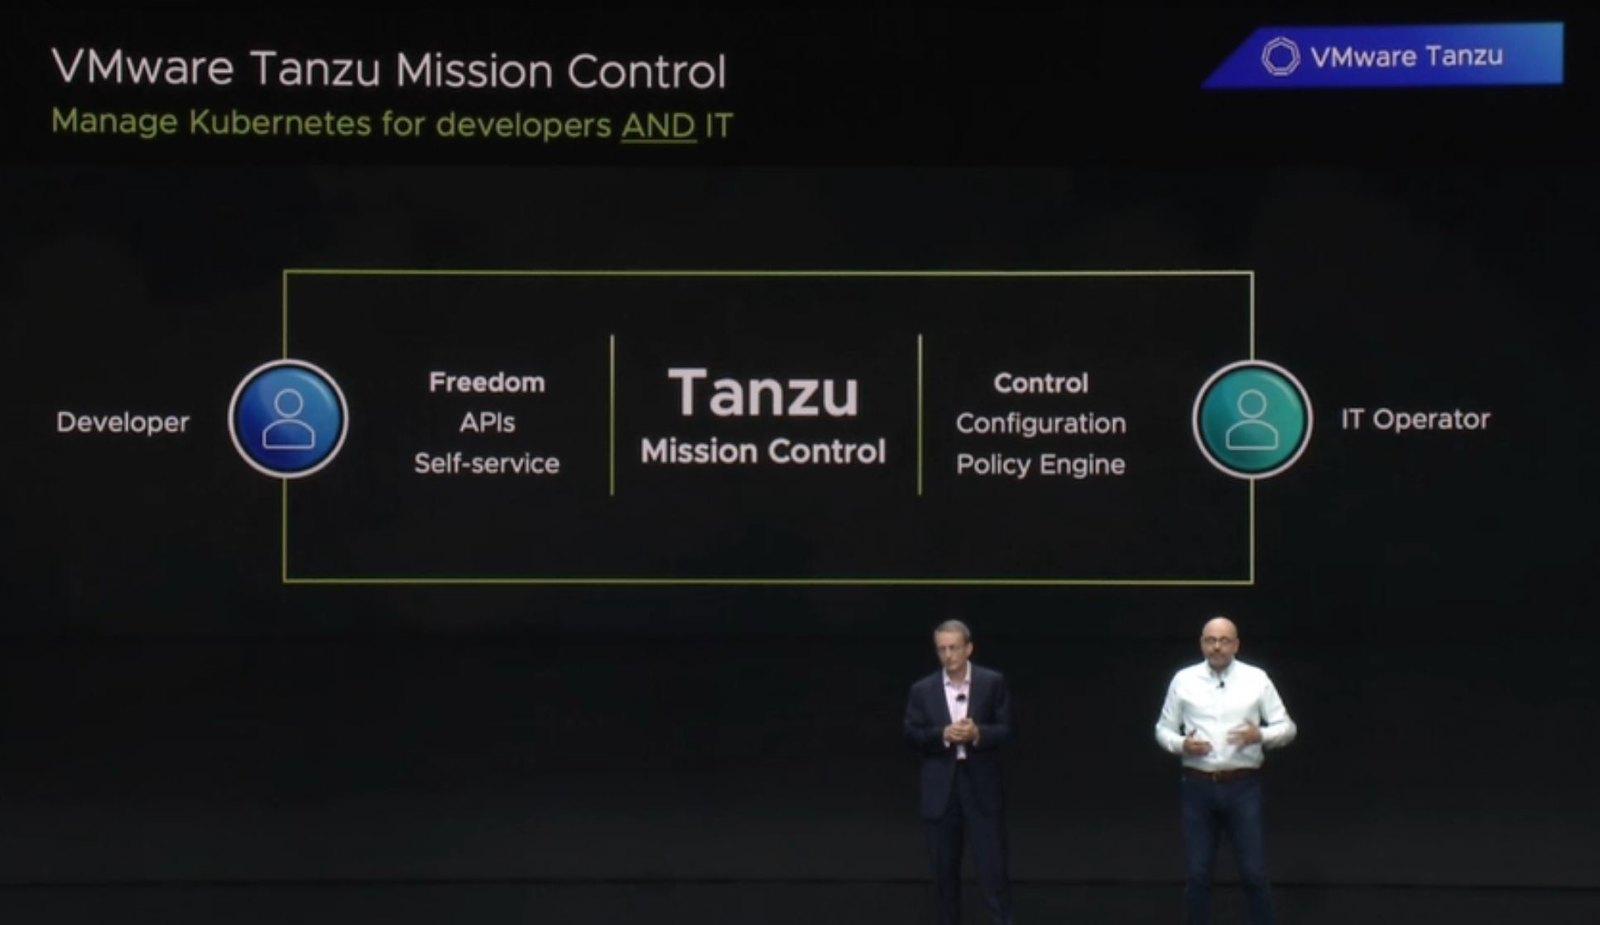 VMware擁抱Kubernetes 宣佈容器管理技術Tanzu